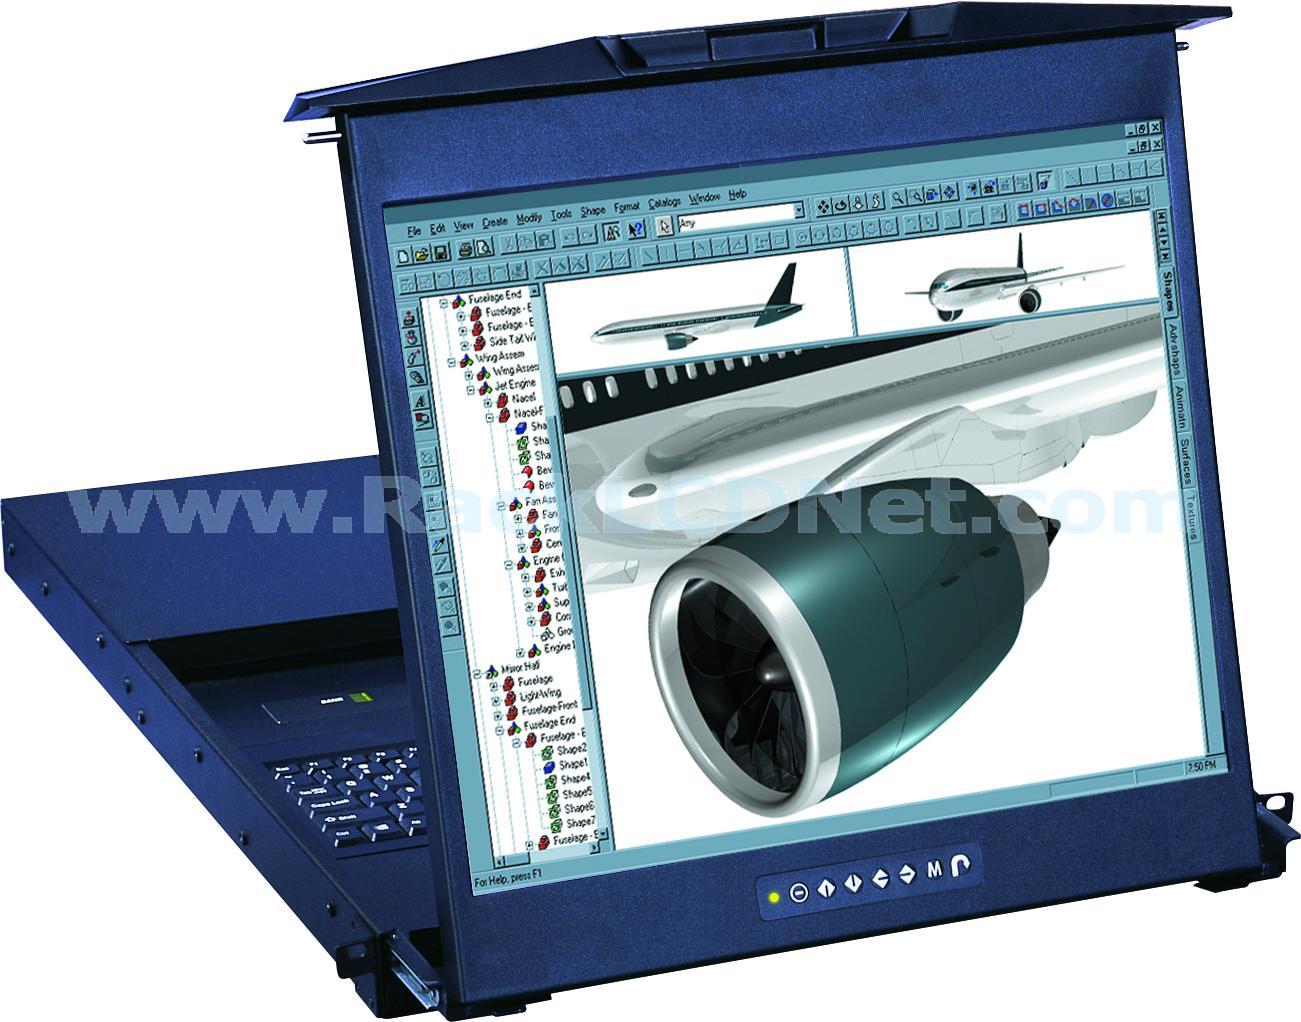 LMK1D 1U Dual Slide Rackmount Keyboard Drawer